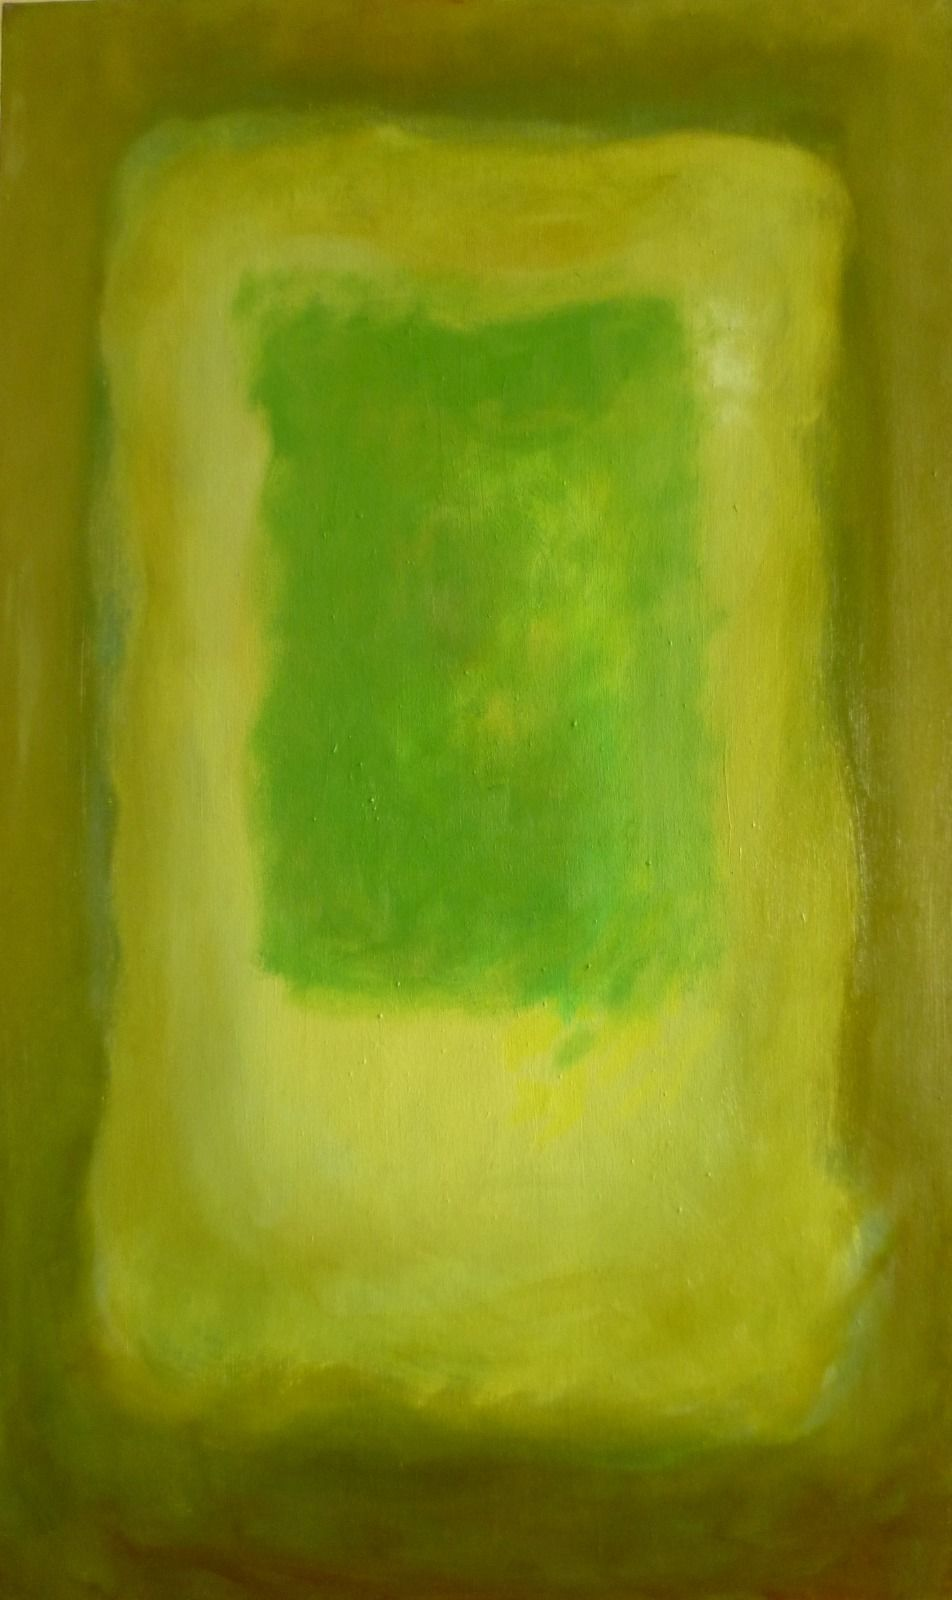 Emerging 6. 61x102x1.8cm (oil on canvas)